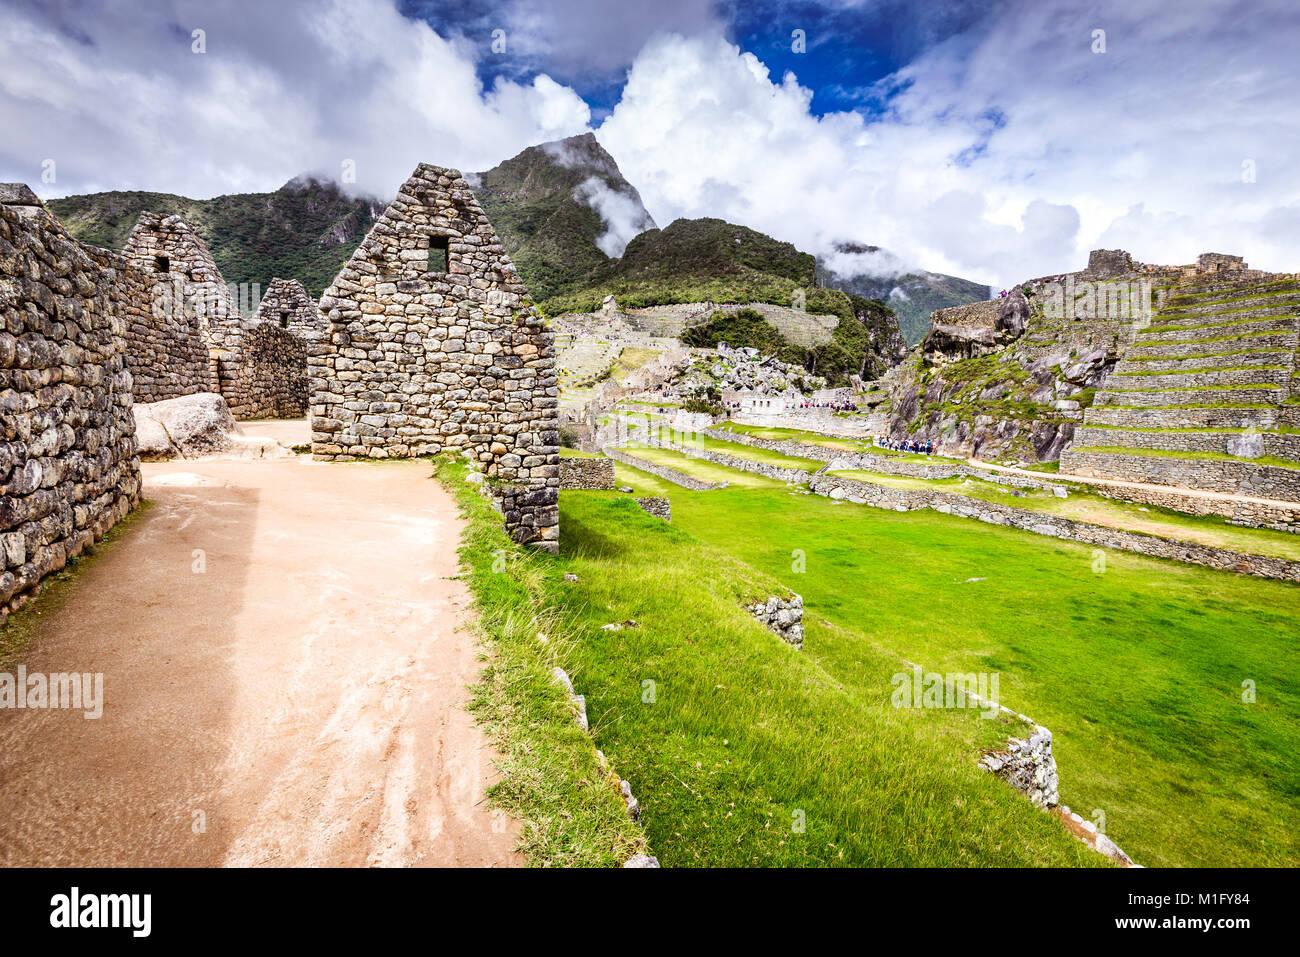 Machu Picchu, Cusco, Peru - Ruins of Inca Empire city and Machupicchu Mountain, Sacred Valley. Amazing world wonder Stock Photo